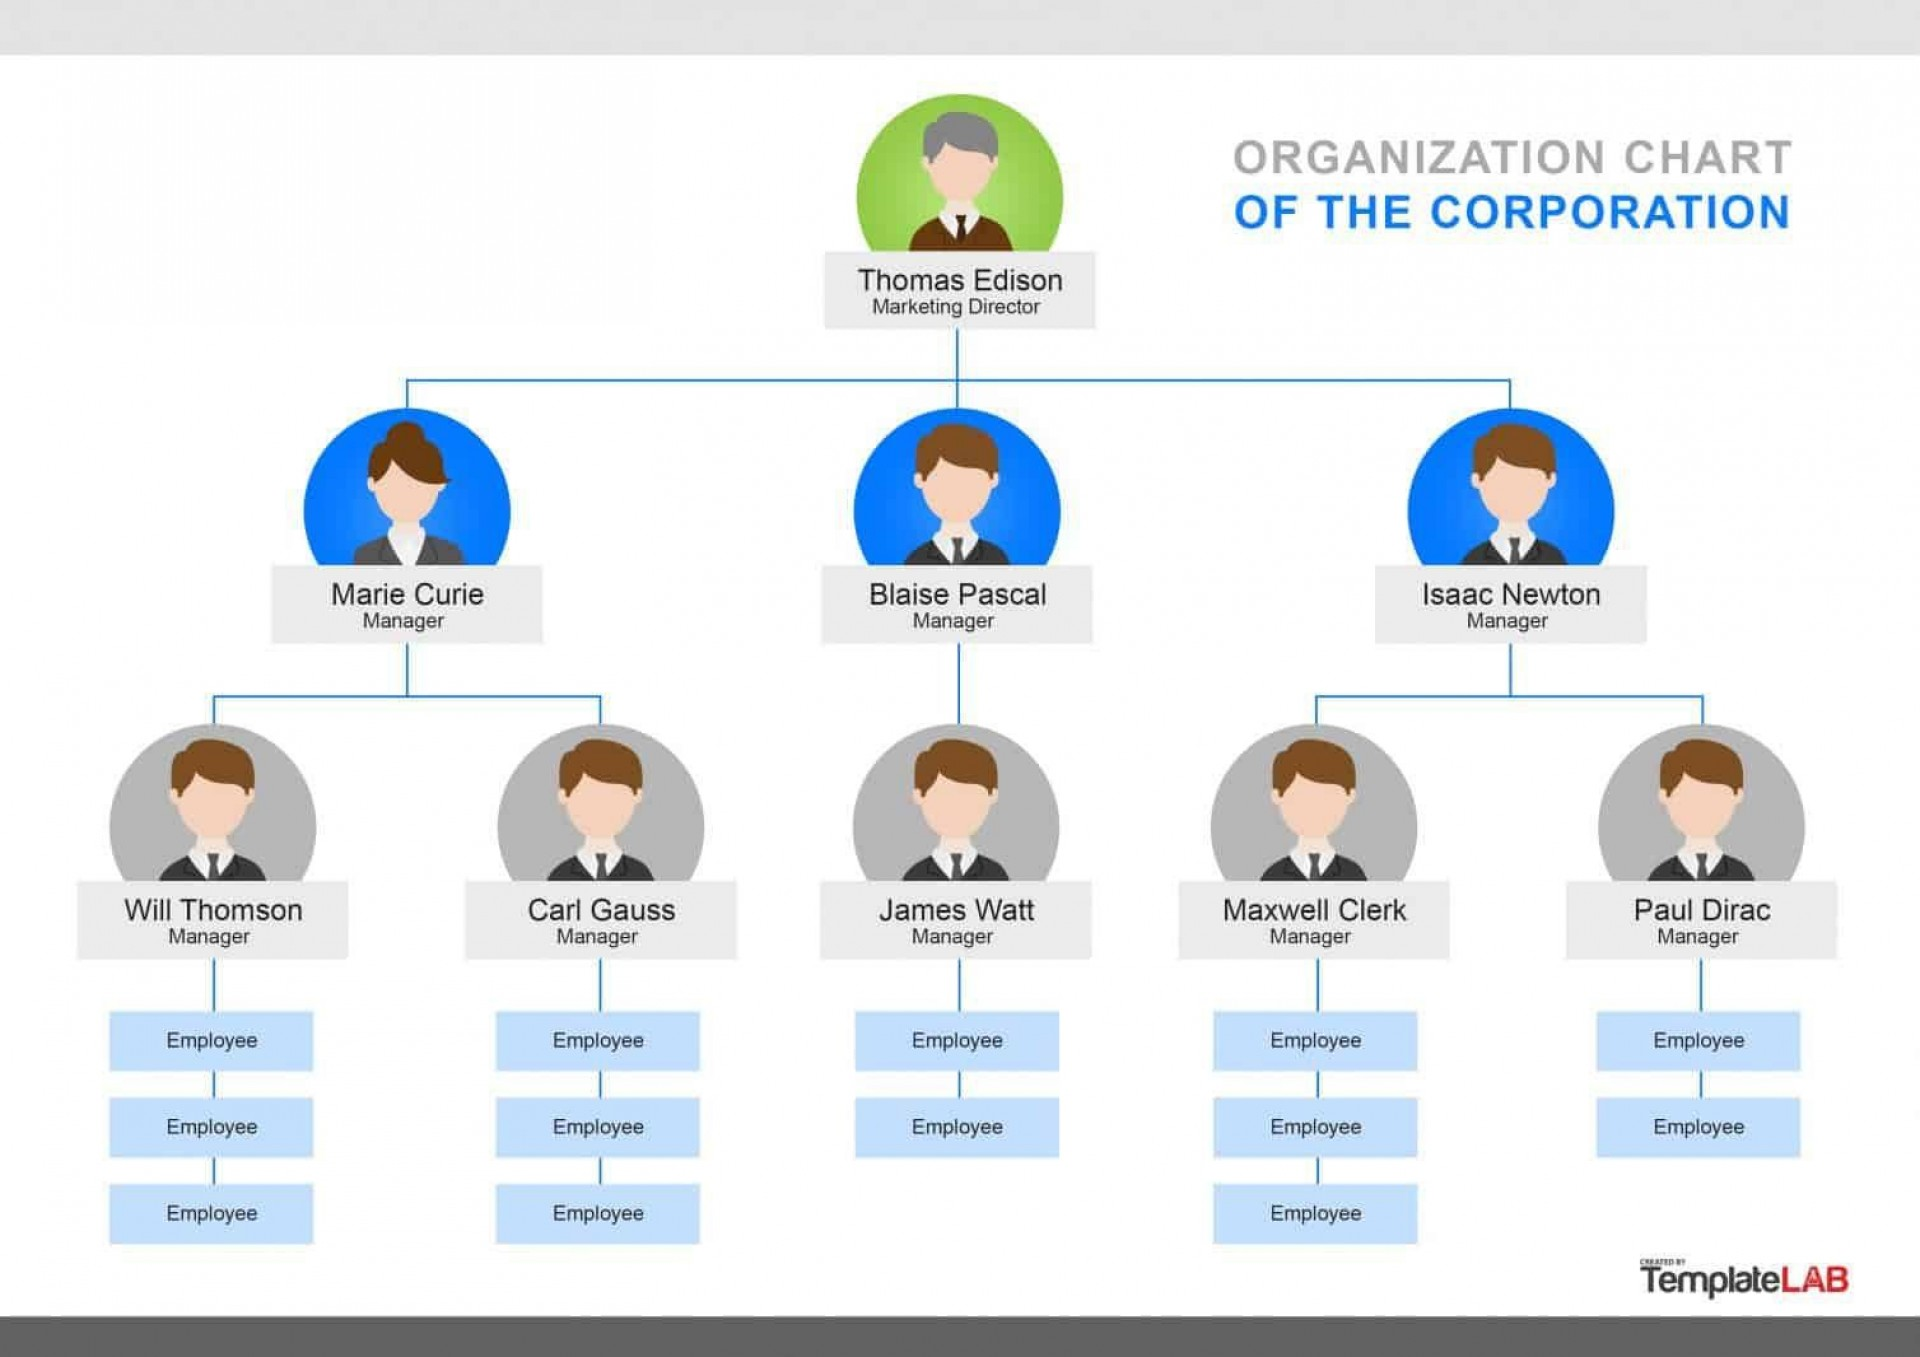 000 Singular Organizational Chart Template Word Concept  2013 2010 20071920